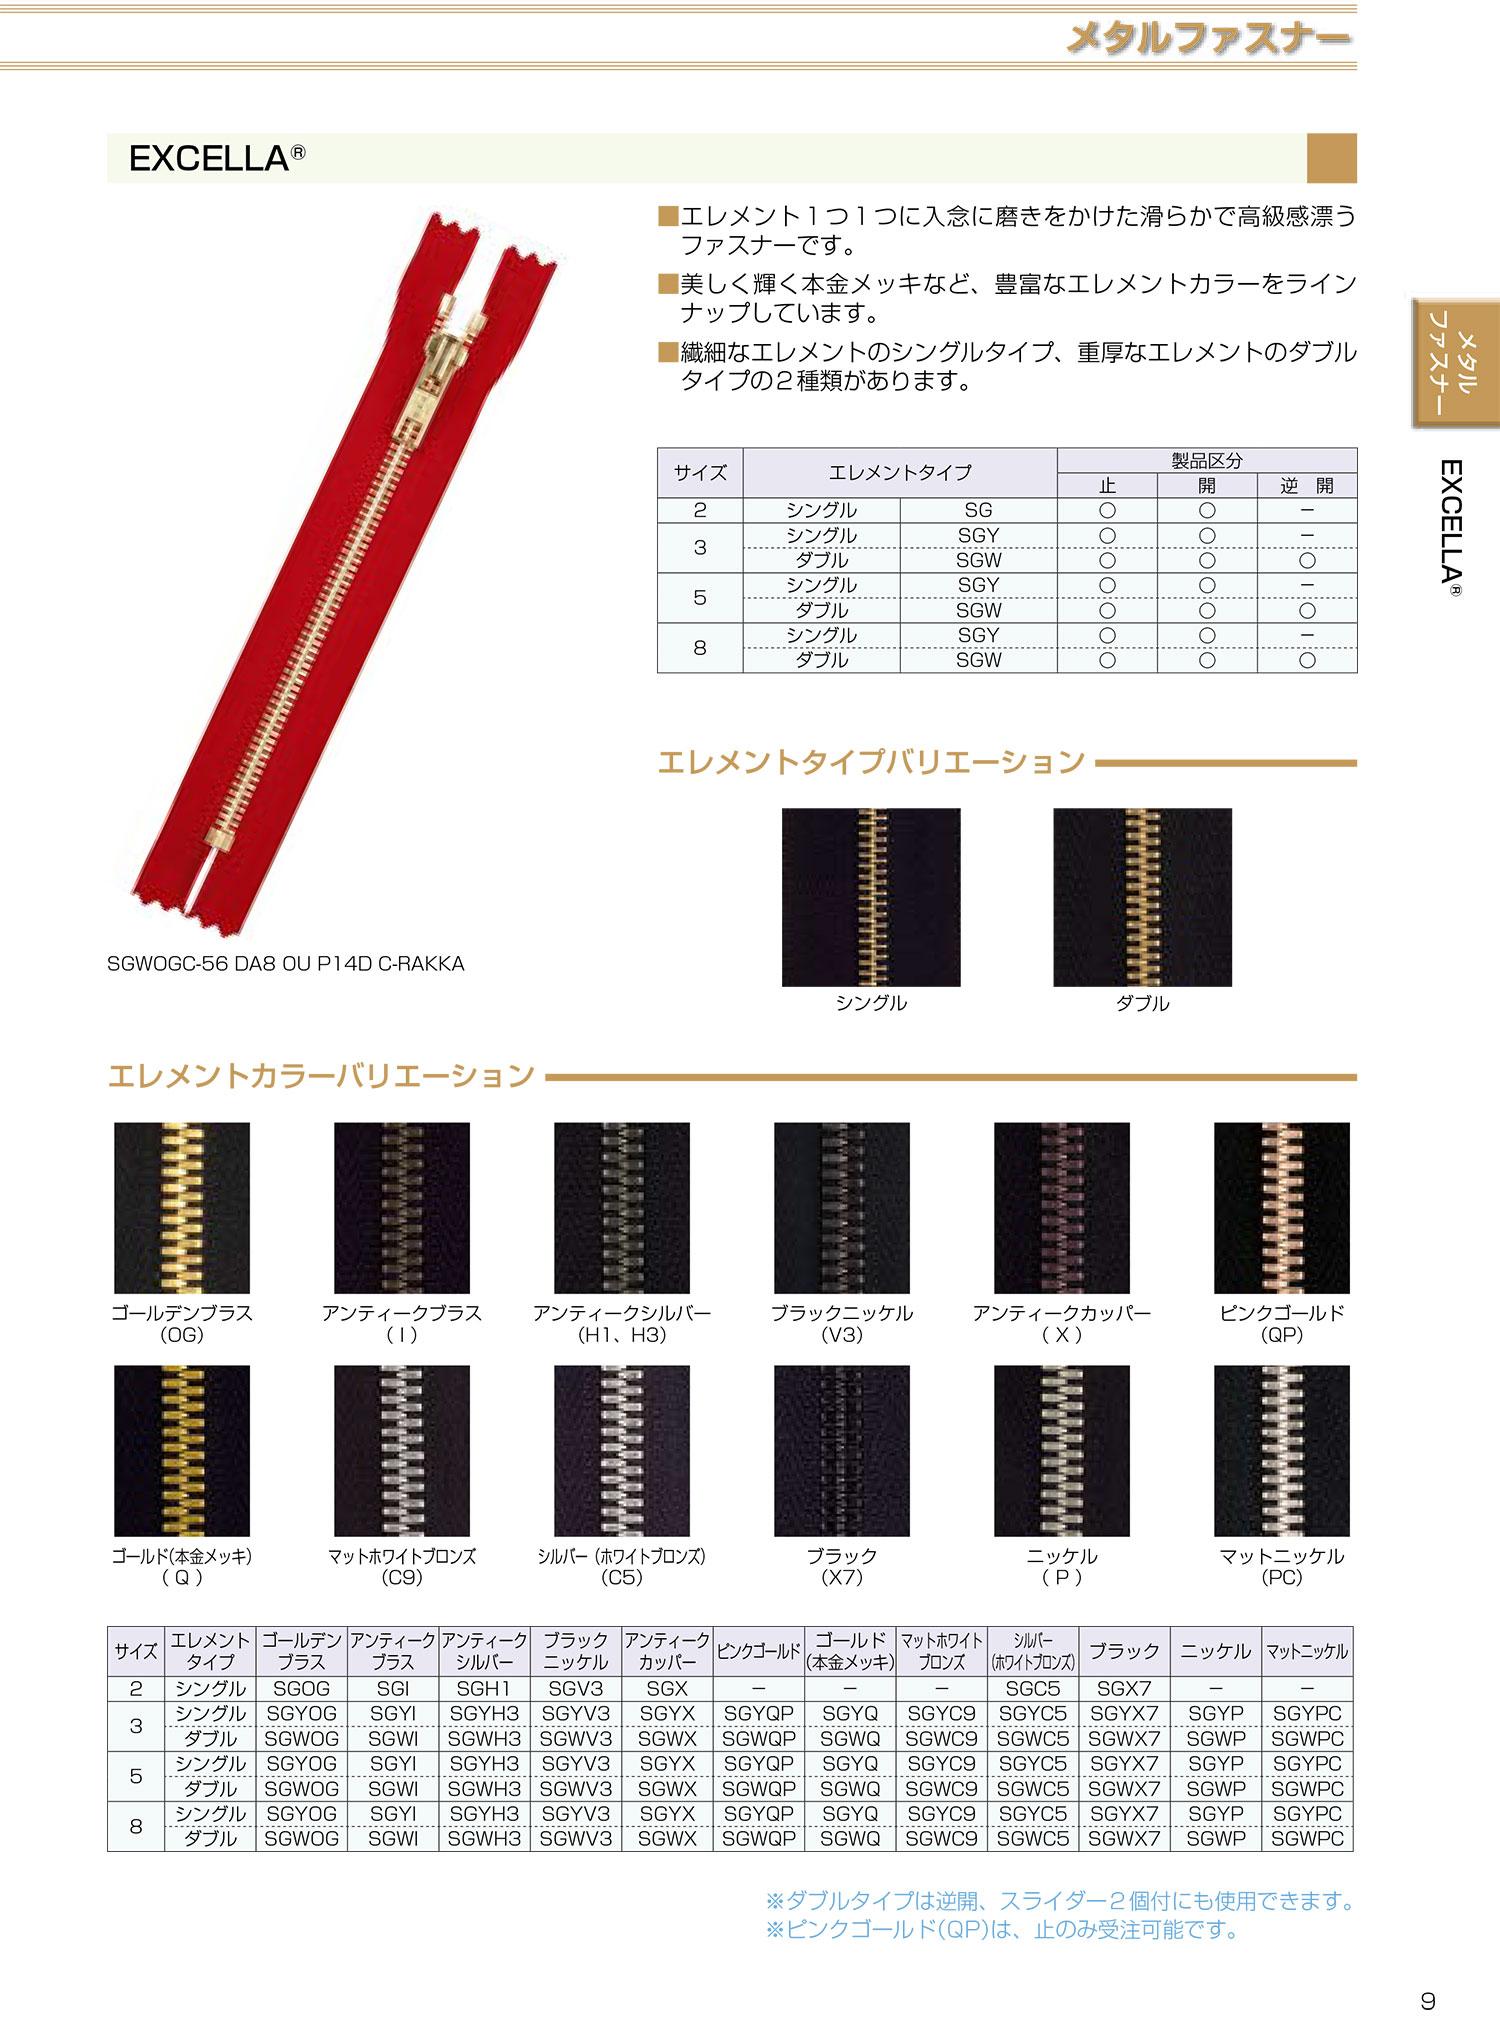 8SGWX7MR エクセラ 8サイズ ブラック 逆開 ダブル[ファスナー] YKK/オークラ商事 - ApparelX アパレル資材卸通販